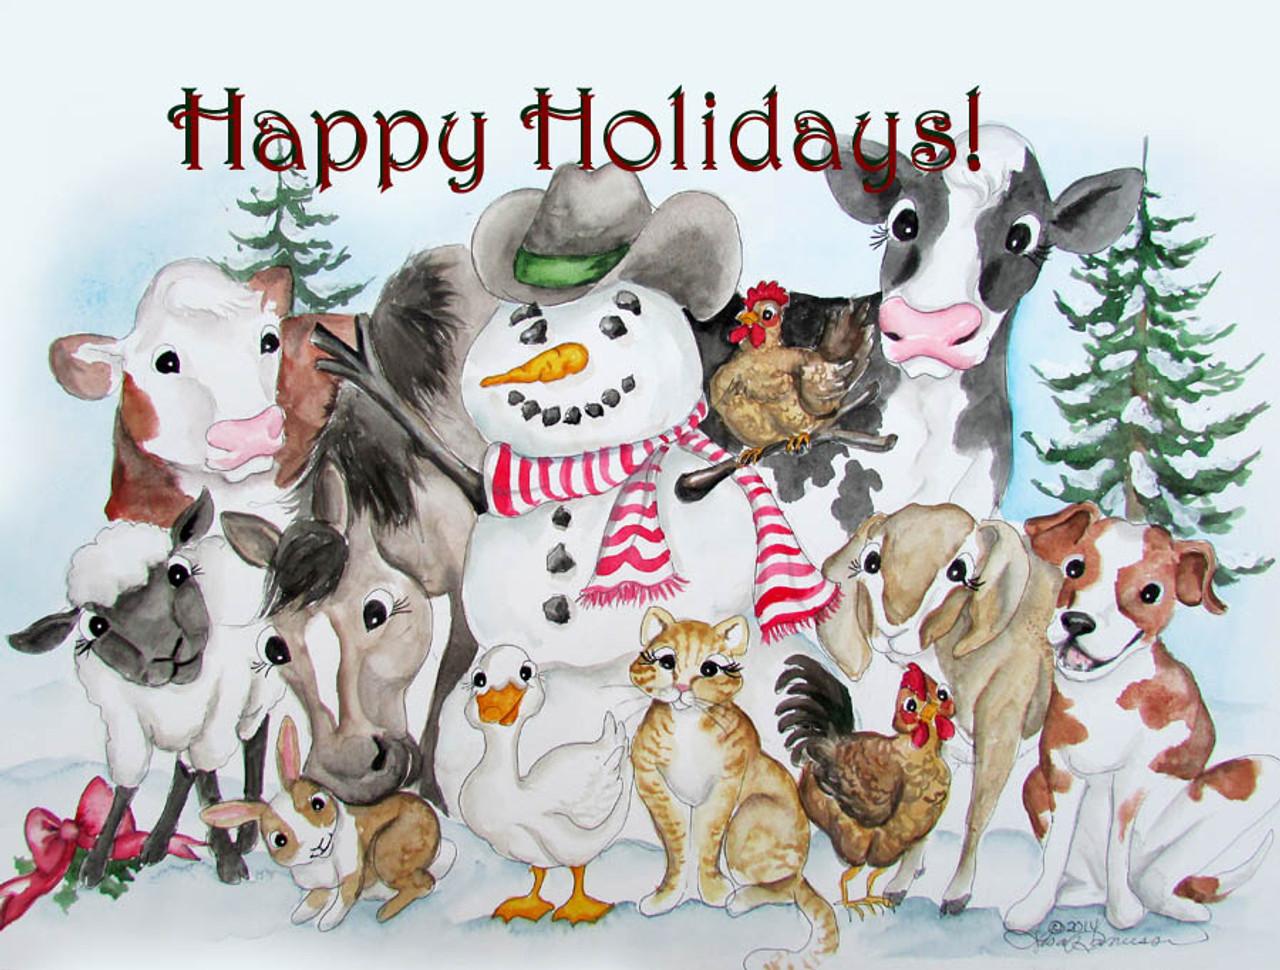 12 cowboy Christmas cards - Udderly Delightful Designs by Lisa Rasmussen